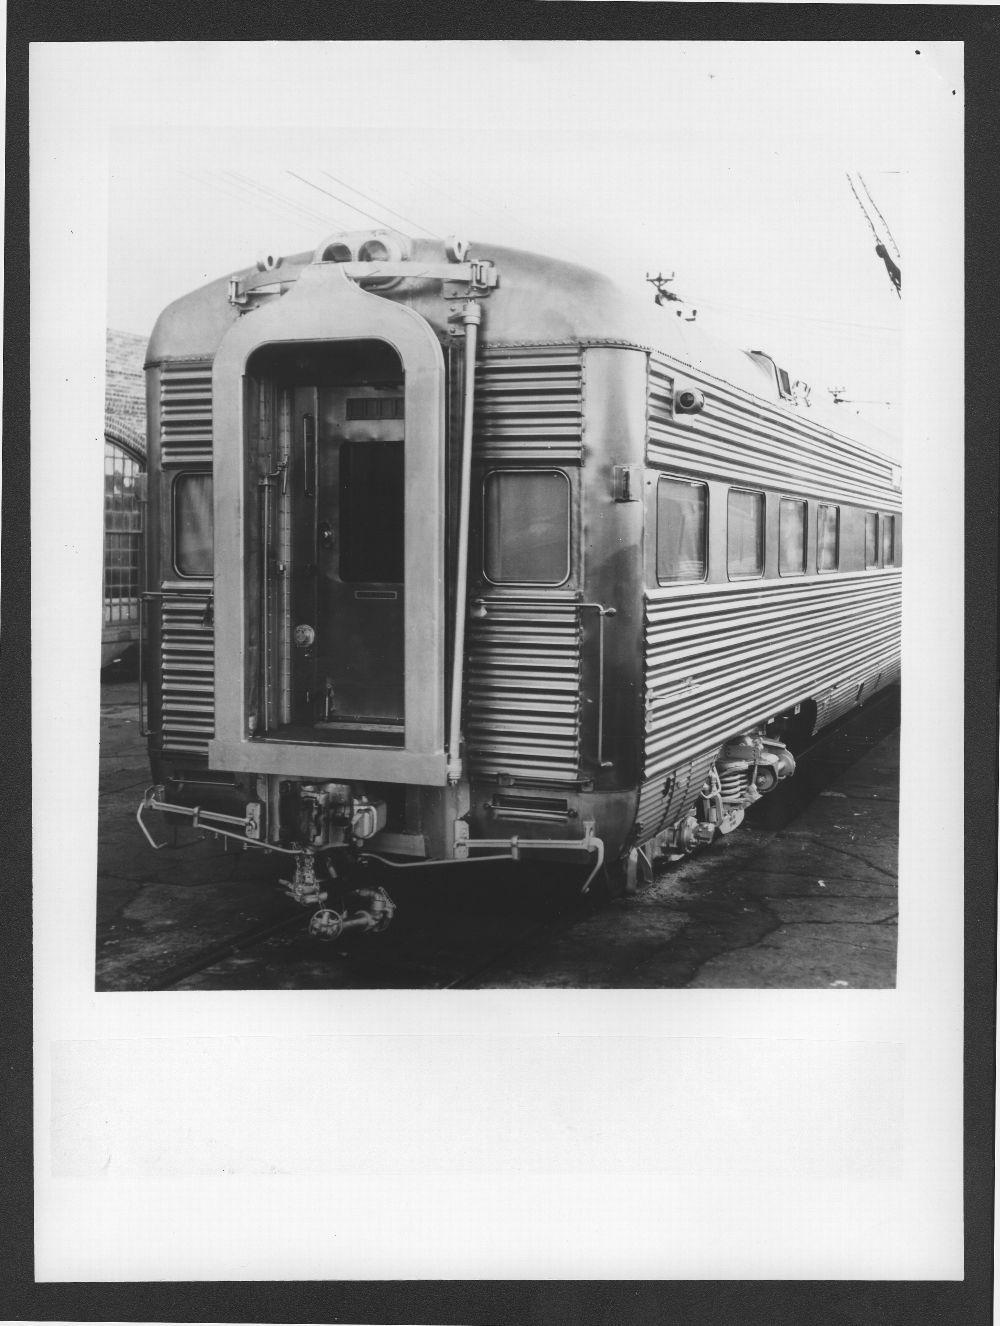 Atchison, Topeka & Santa Fe Railway's Vista Cavern passenger car